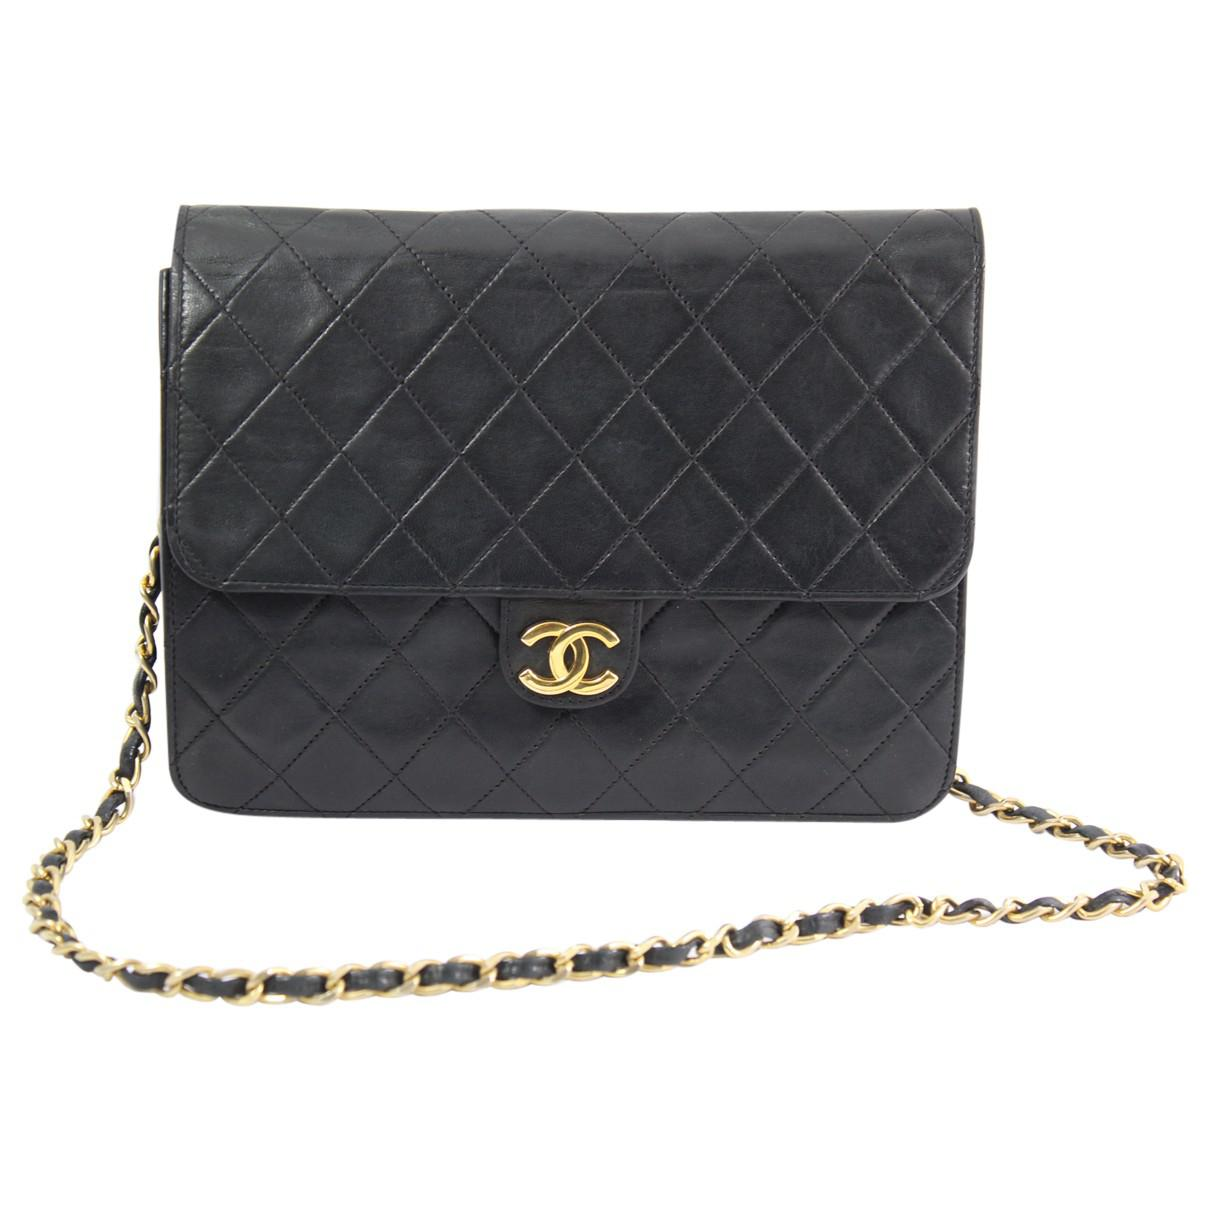 d5105af068ff50 Lyst - Chanel Pre-owned Wallet On Chain Leather Handbag in Black